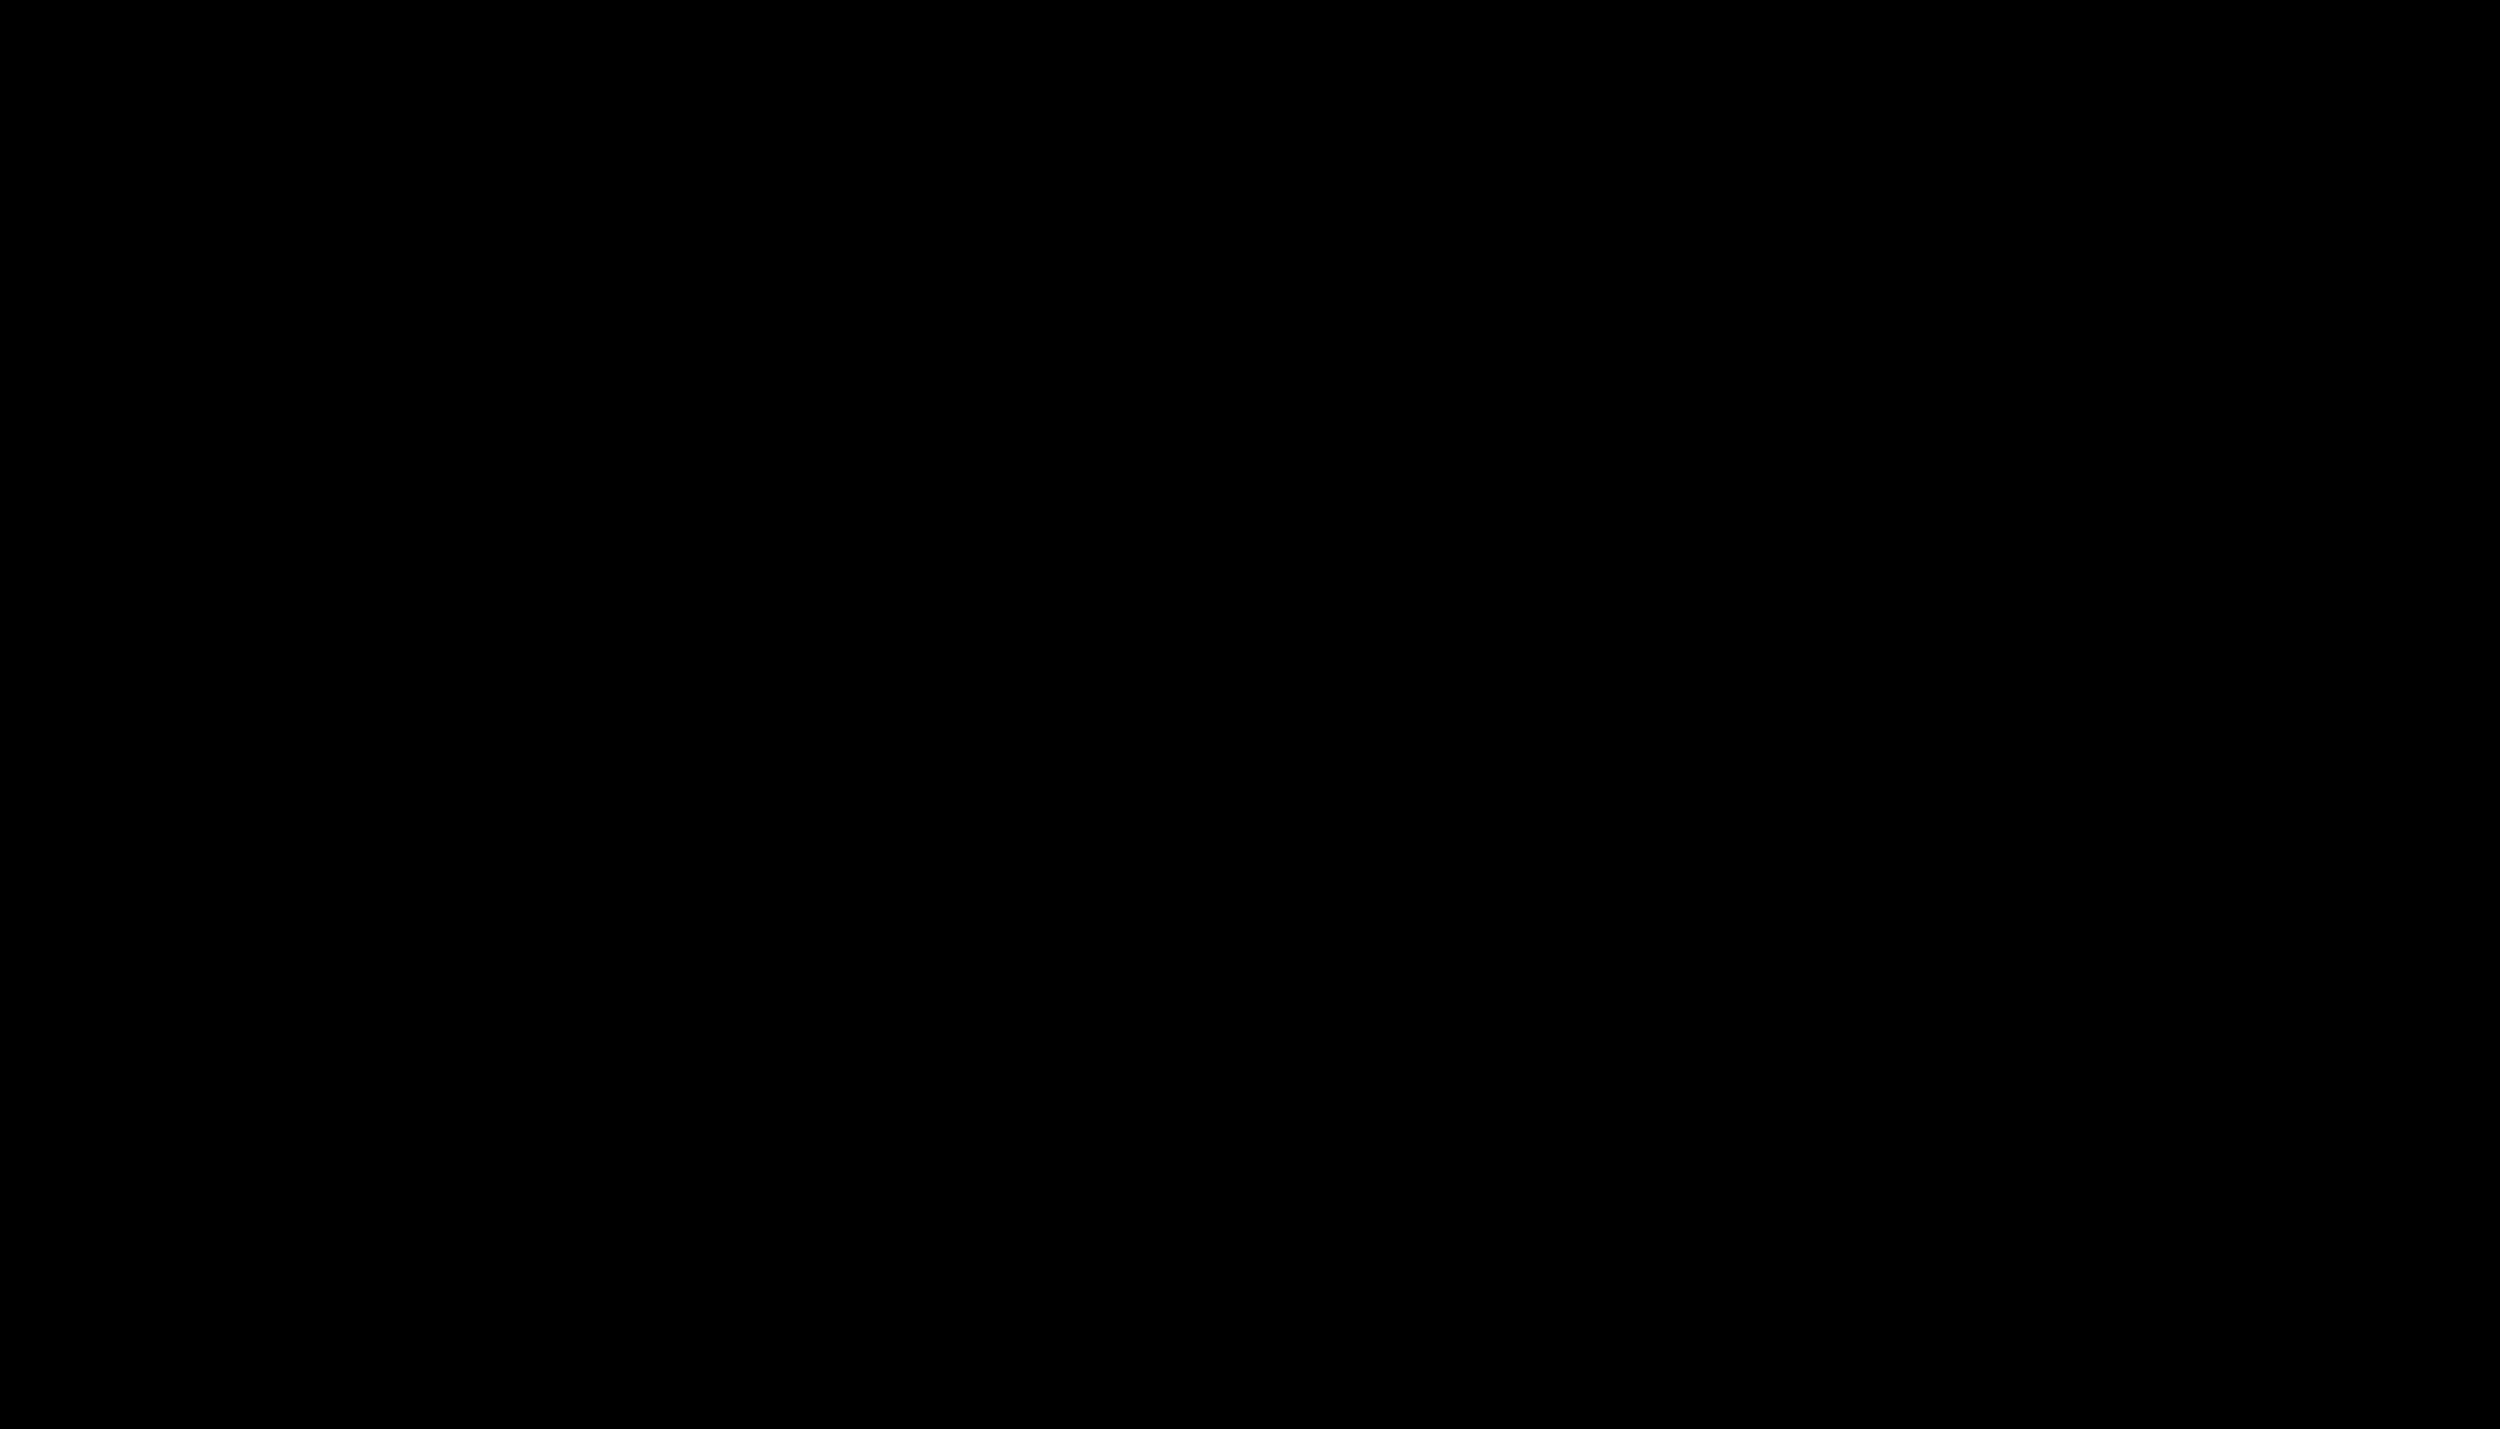 pn logo-expanded-01.png